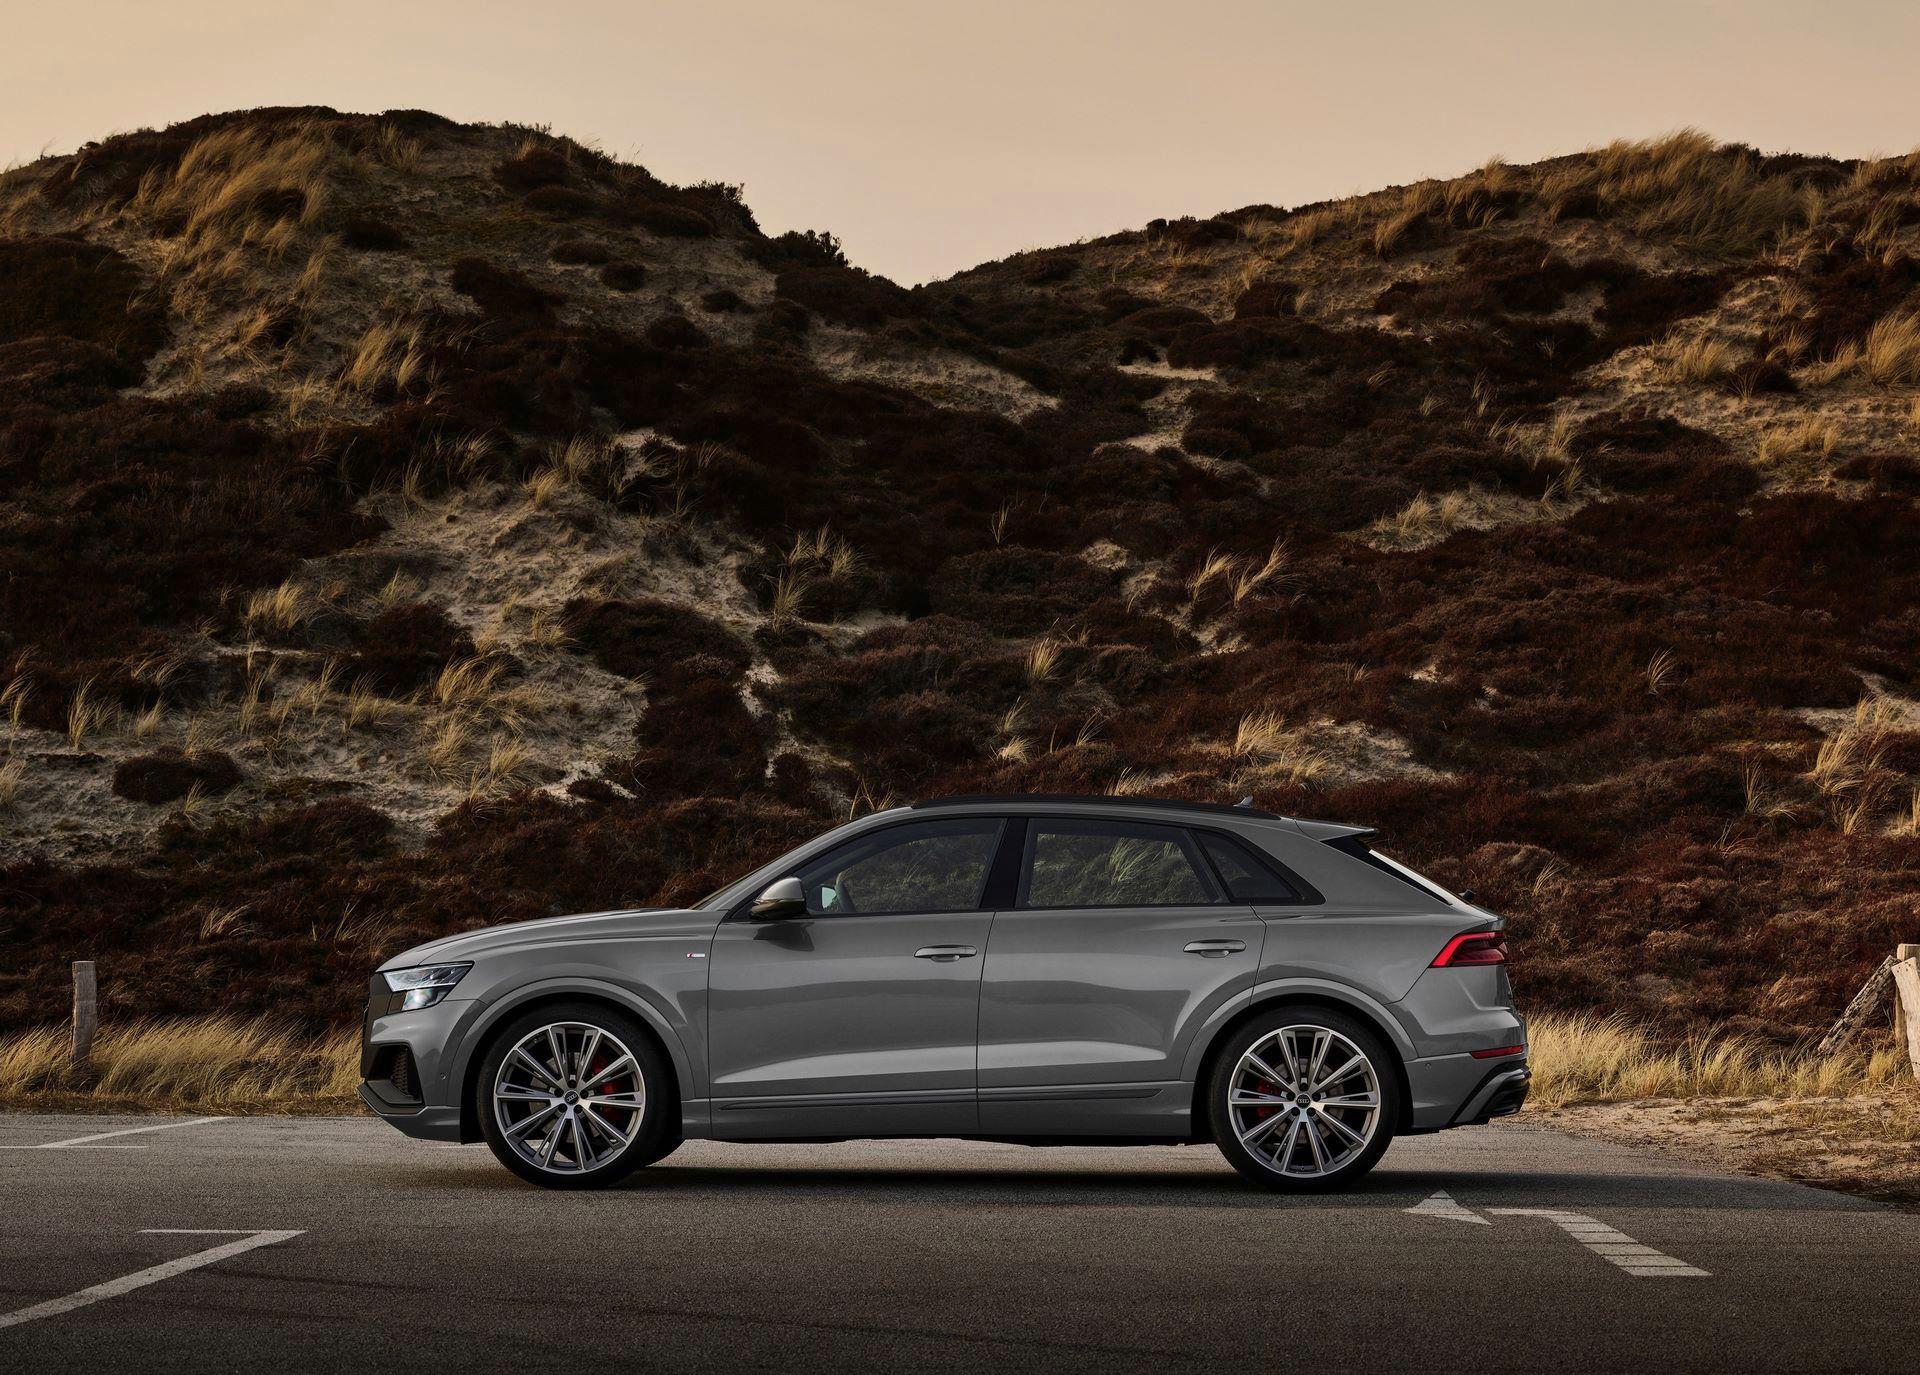 Audi-A4-A5-Q7-Q8-Competition-And-Competition-Plus-Trims-22